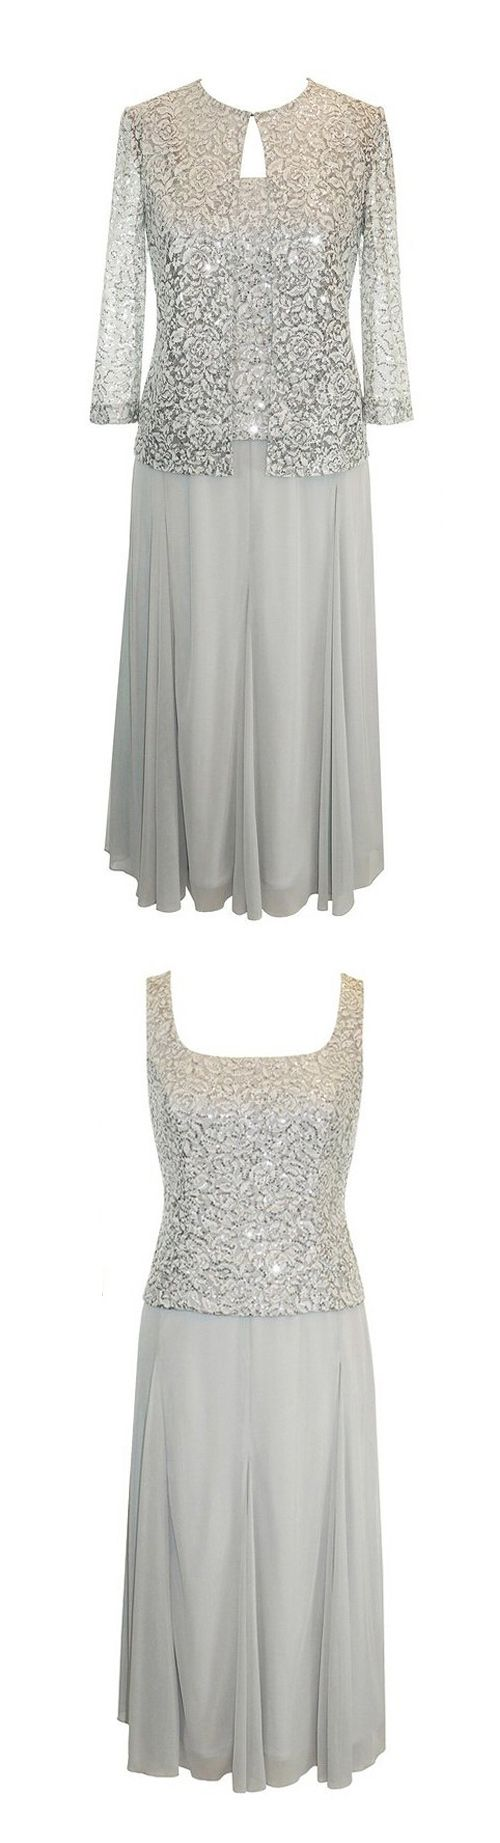 Grandma dress for wedding?